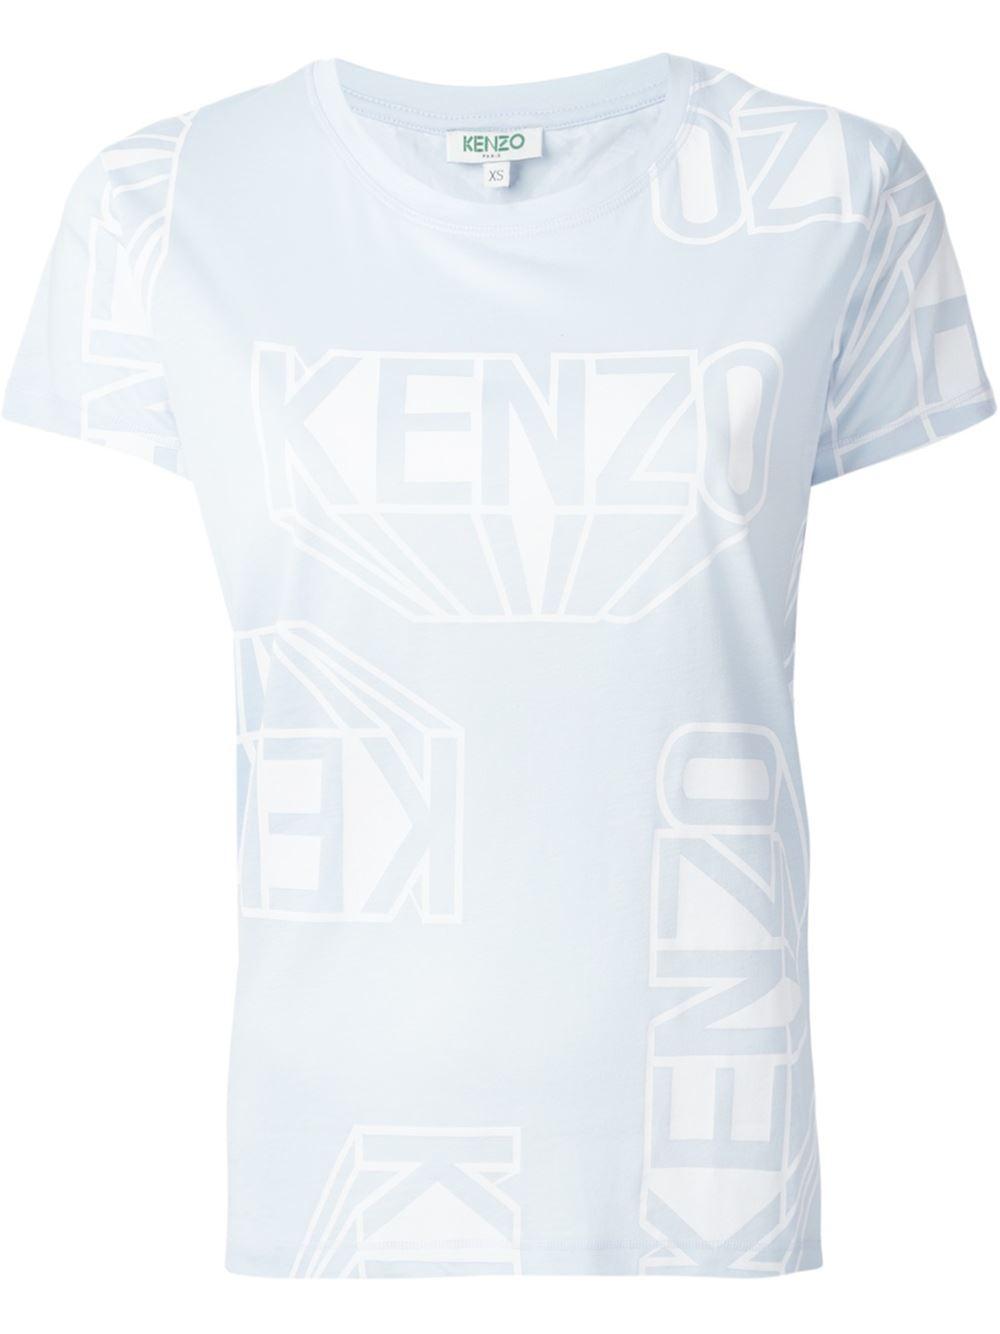 kenzo 39 39 t shirt in blue lyst. Black Bedroom Furniture Sets. Home Design Ideas